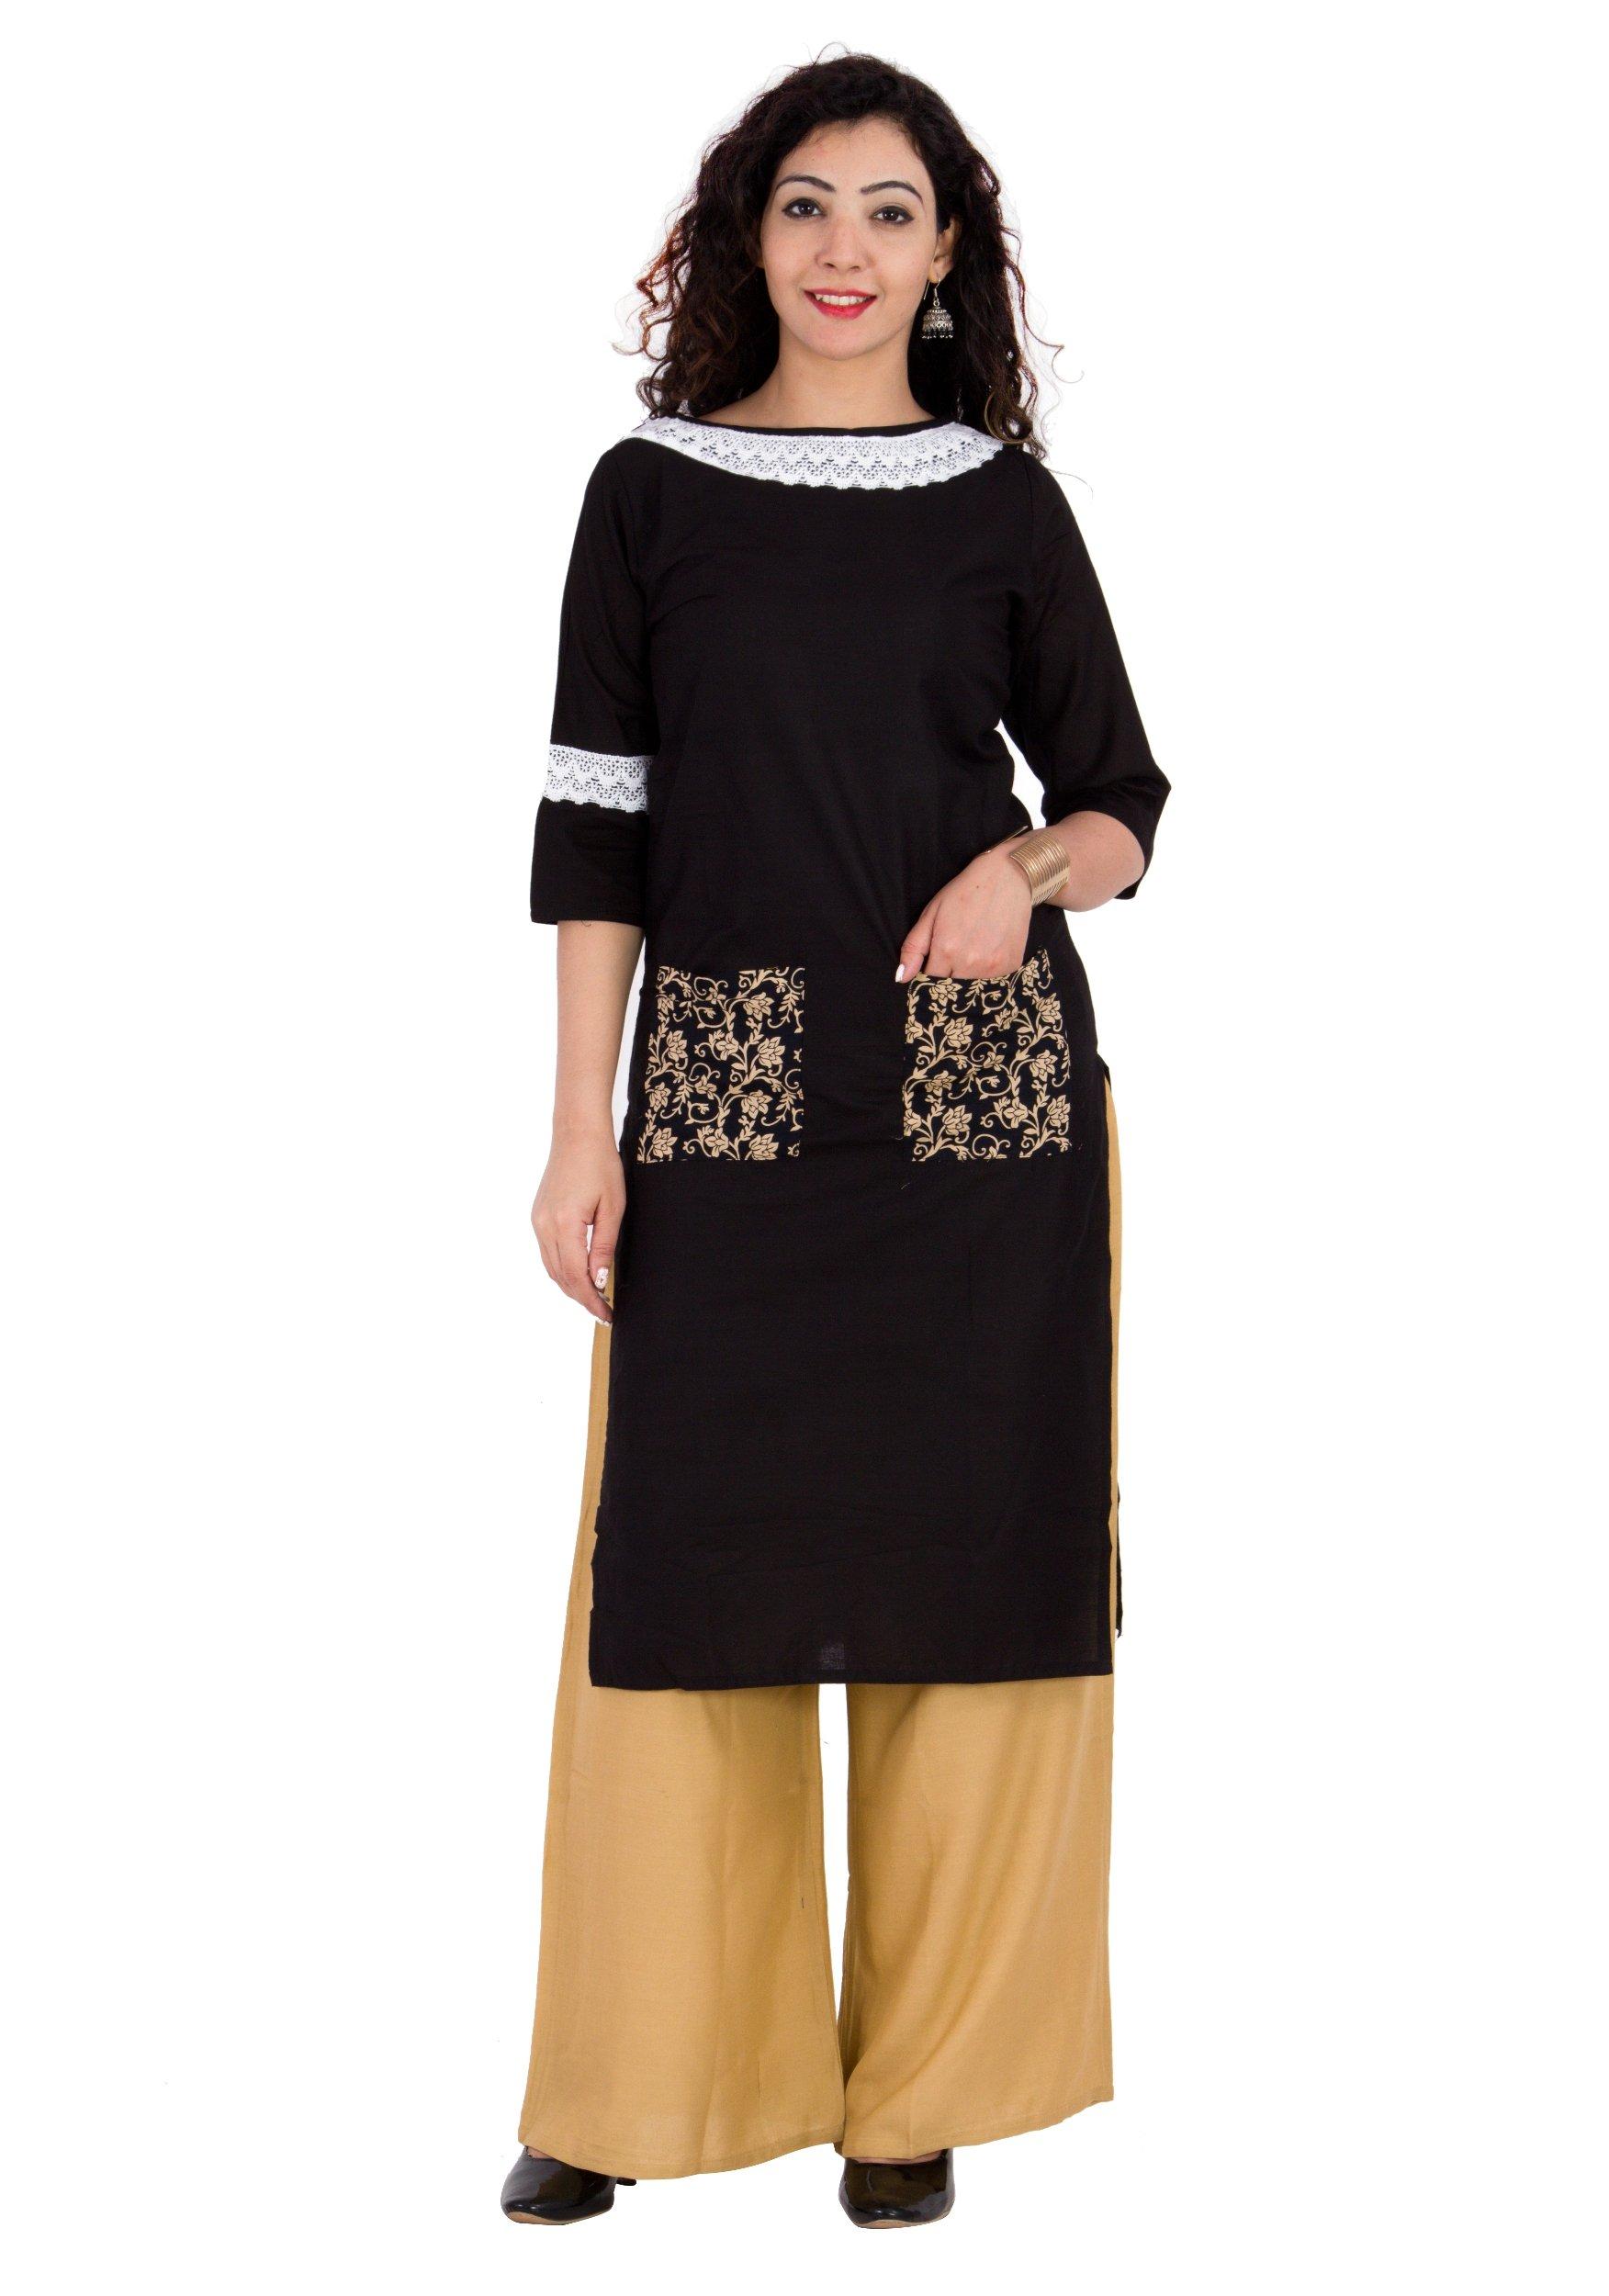 BrightJet Designer Black Cotton Lacework Women Fashion Kurti A-line Kurta Top Tunic with Rayon Solid Beige Plazzo Set Party Dress Casual (XXL) by BrightJet (Image #1)